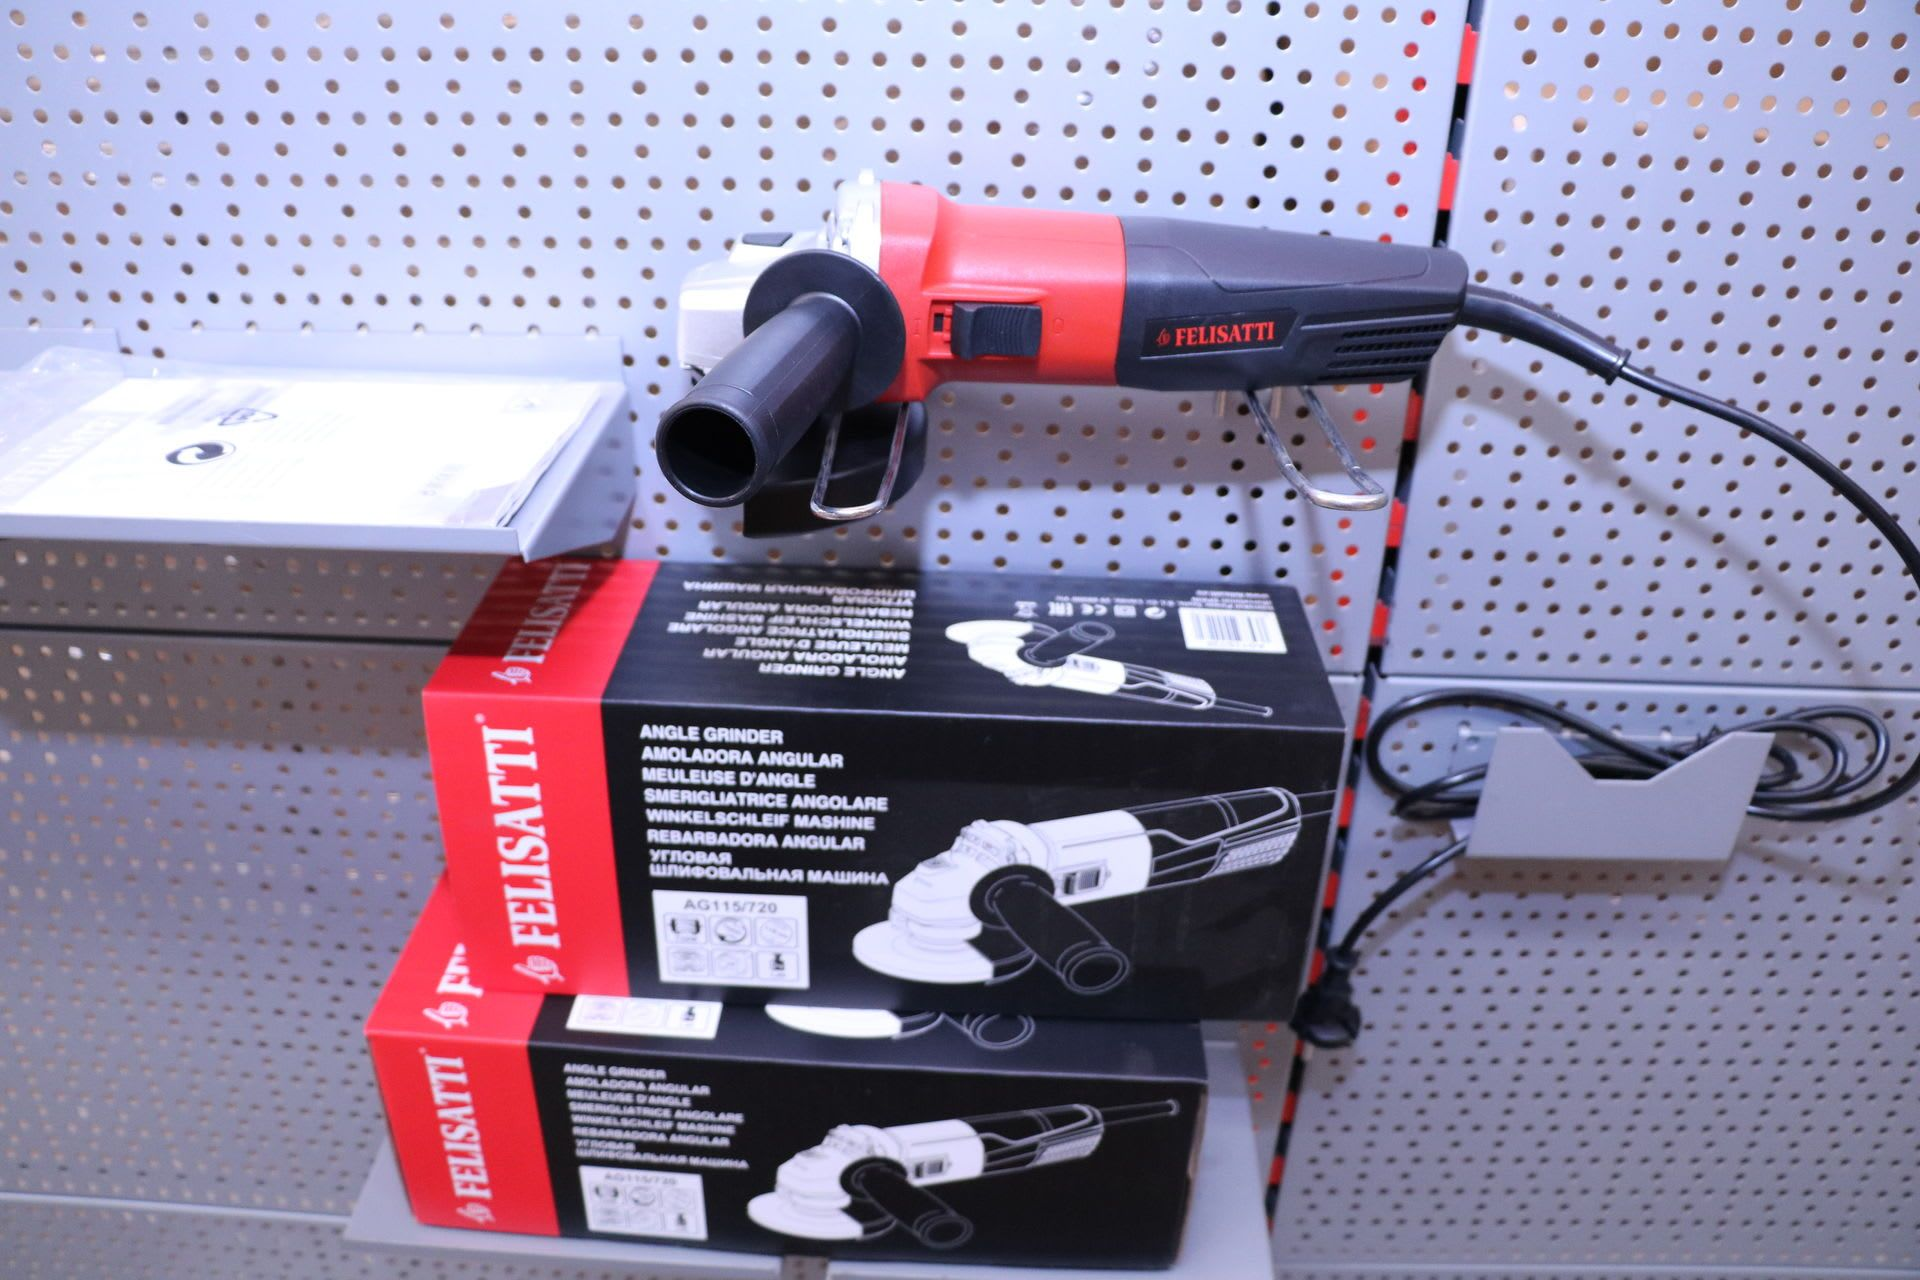 Amoladora angular FELISATTI AG 115 / 720 2